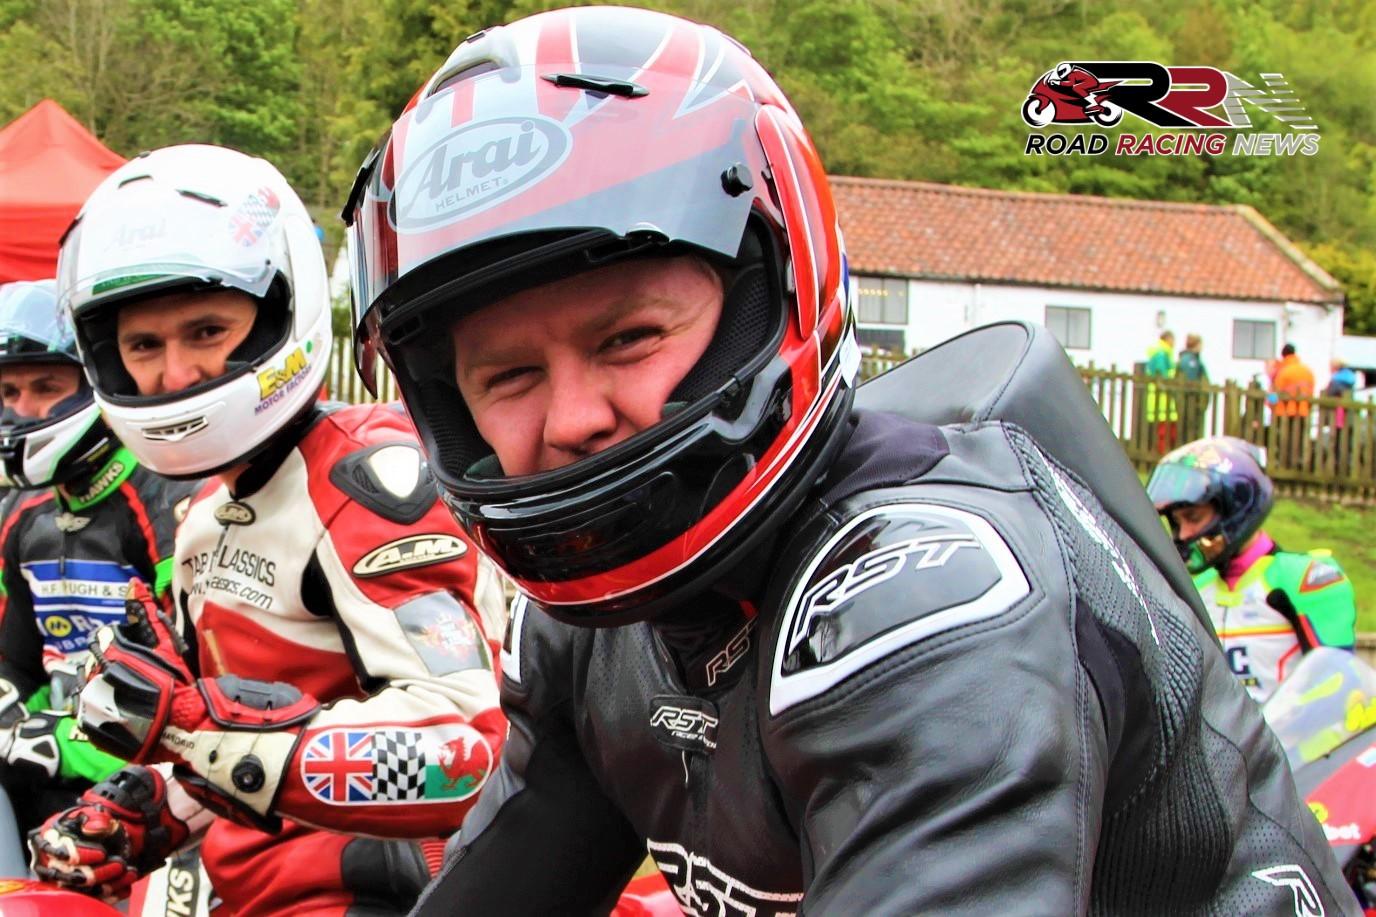 Road Racer's Adventures: CRMC, Cadwell Park